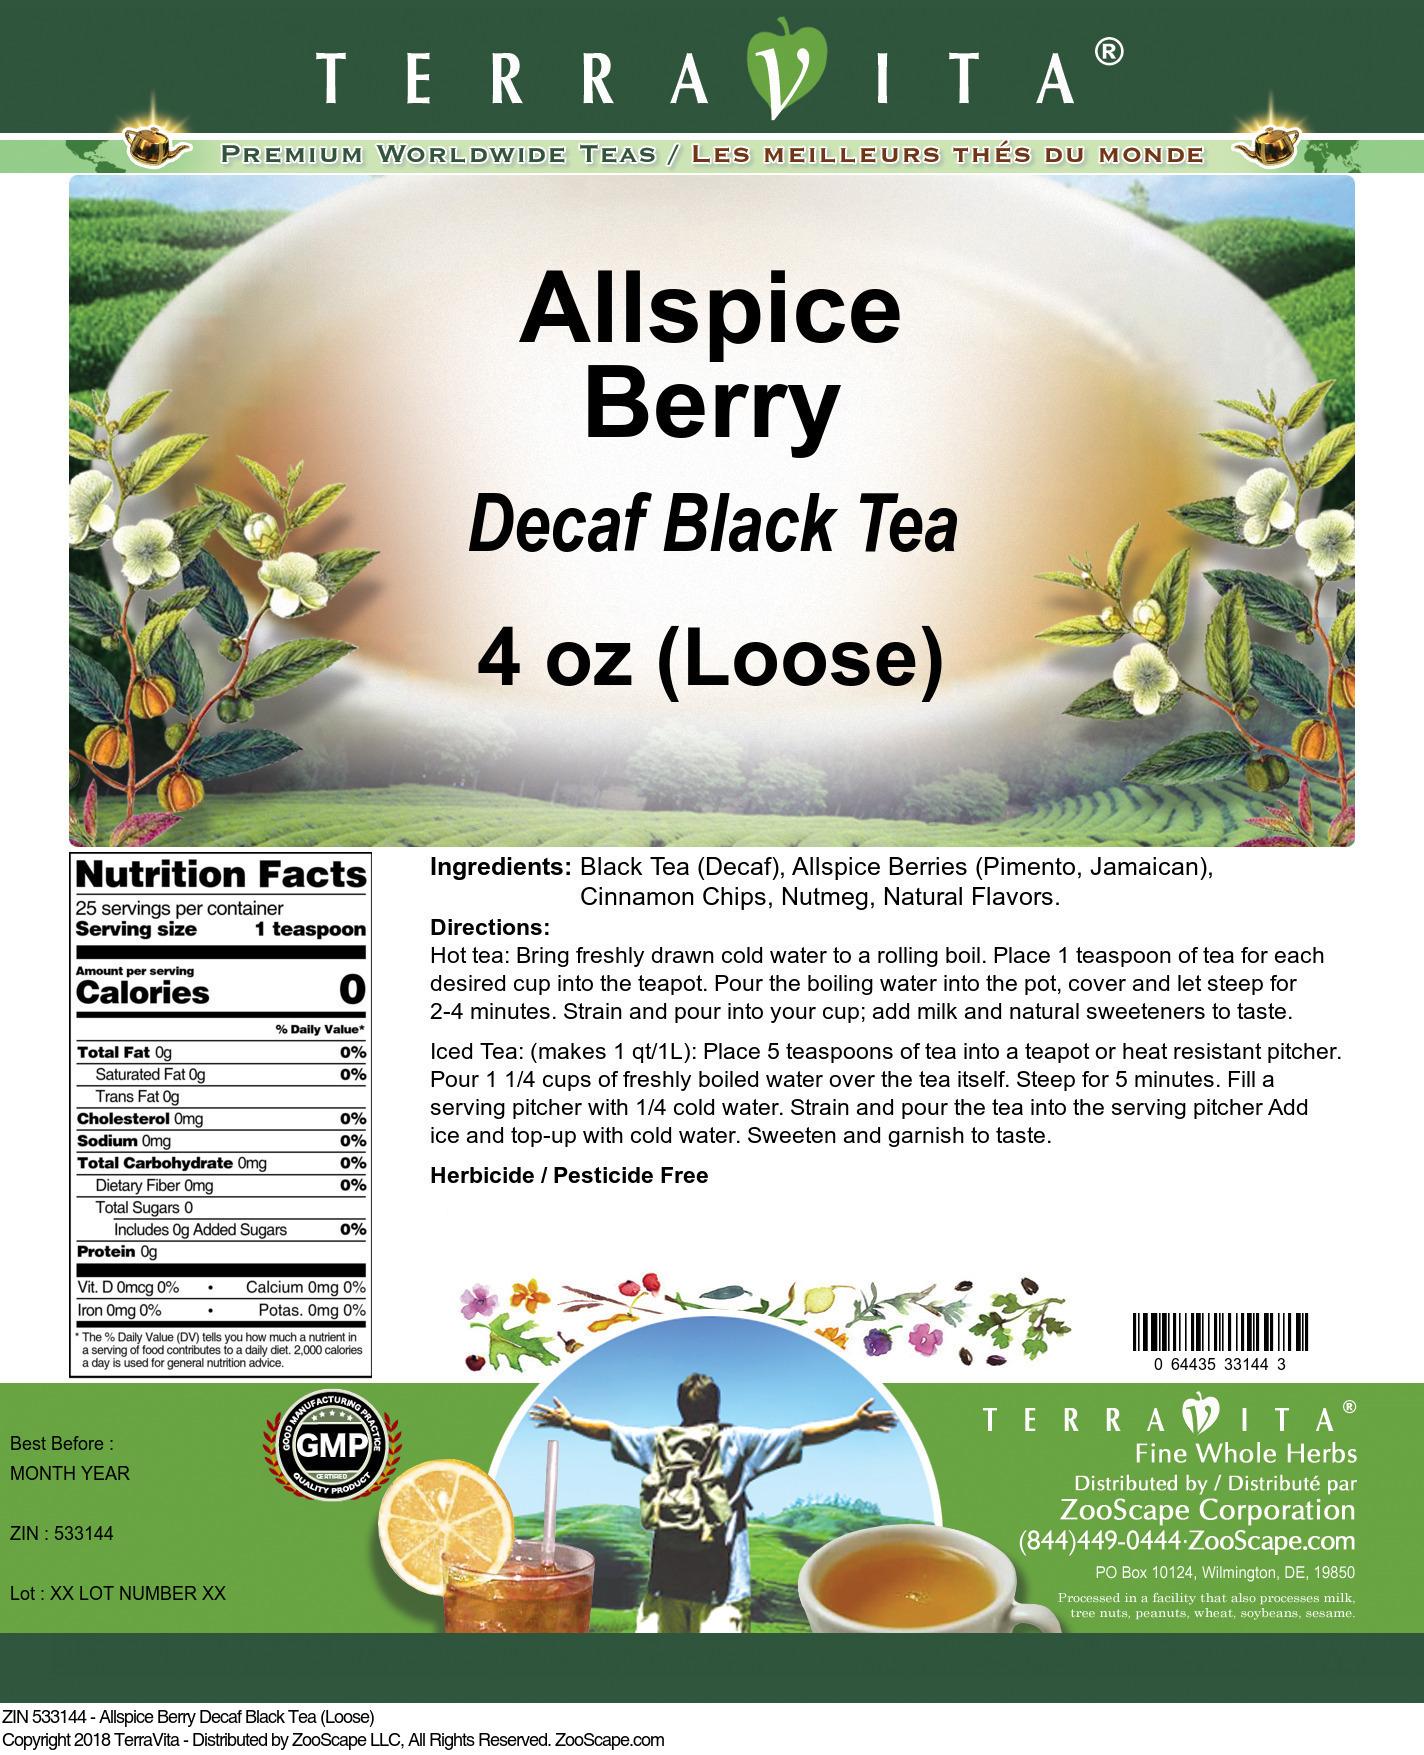 Allspice Berry Decaf Black Tea